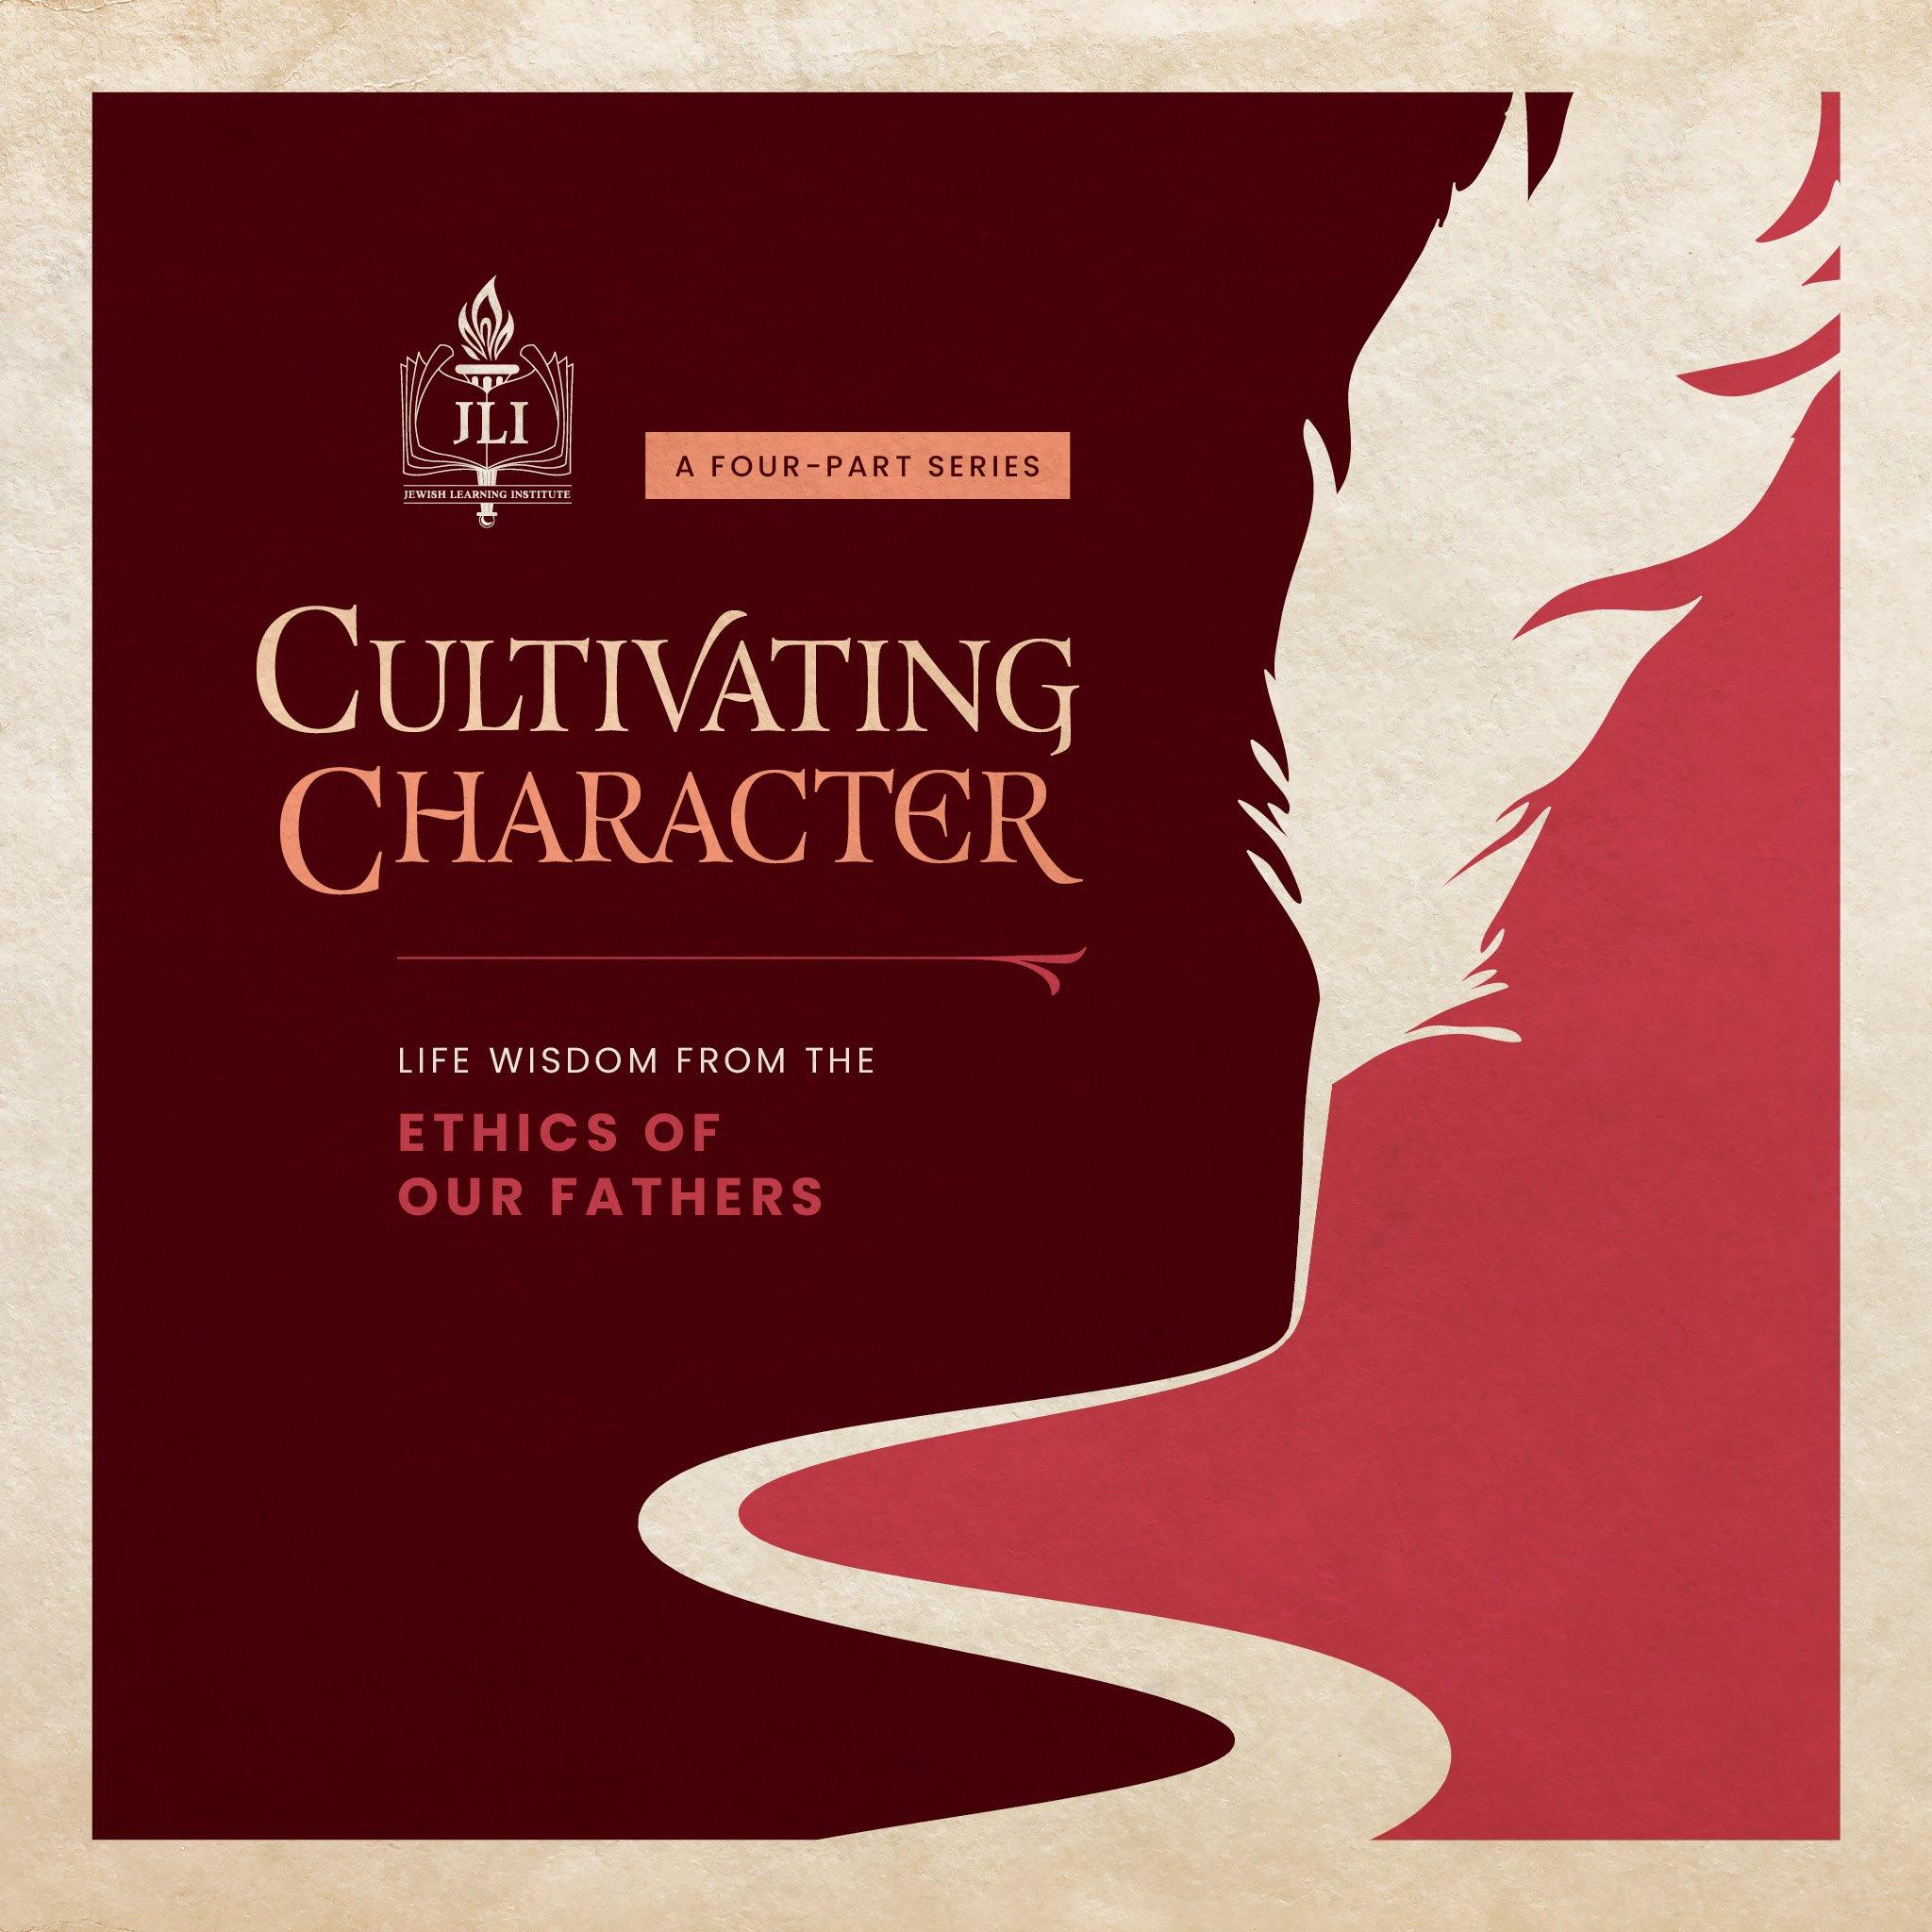 Cultivating Character_Social Media_Square.jpg